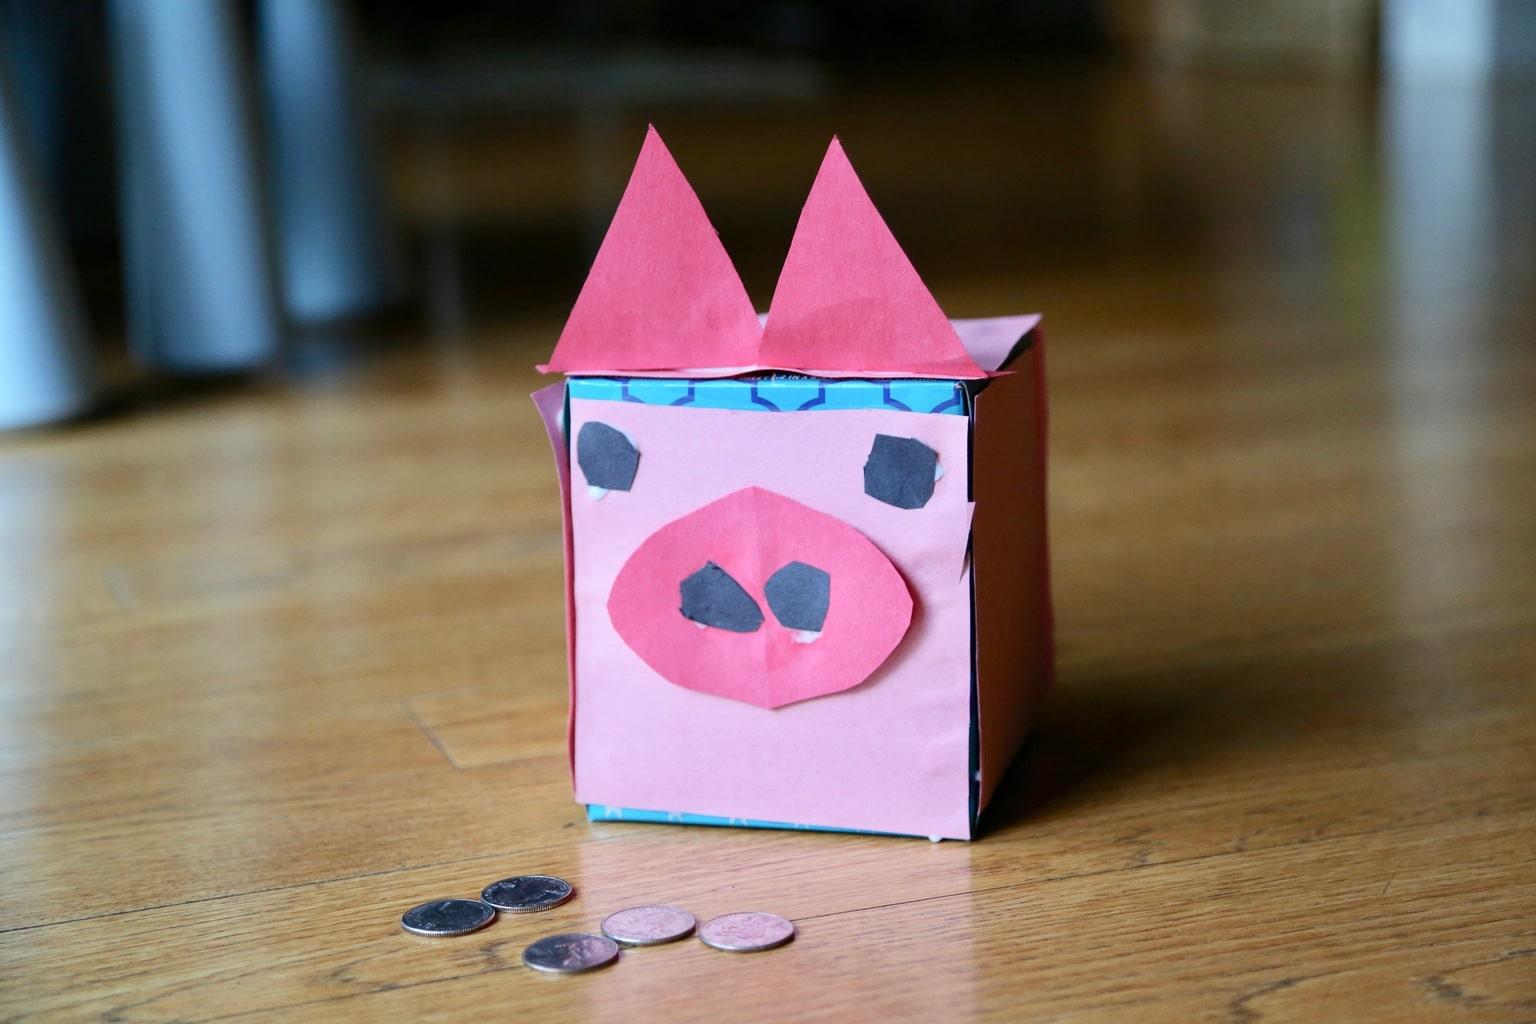 Piggy Bank with quarters